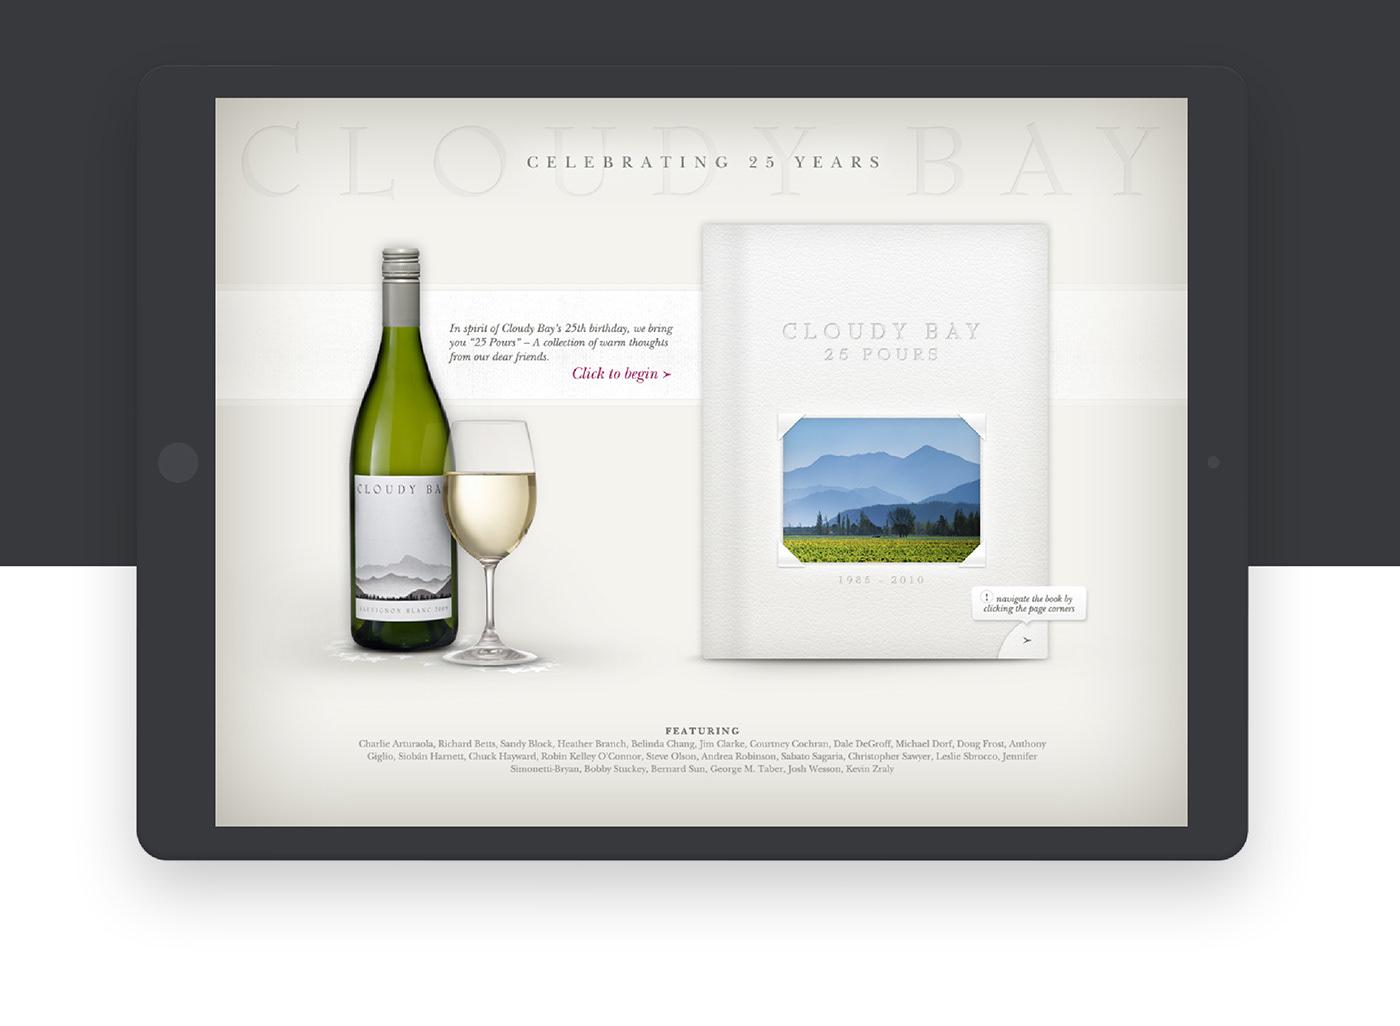 Cloudy bay wine moet hennessy interactive  SOCIAL MEDIA  FACEBOOK  media press